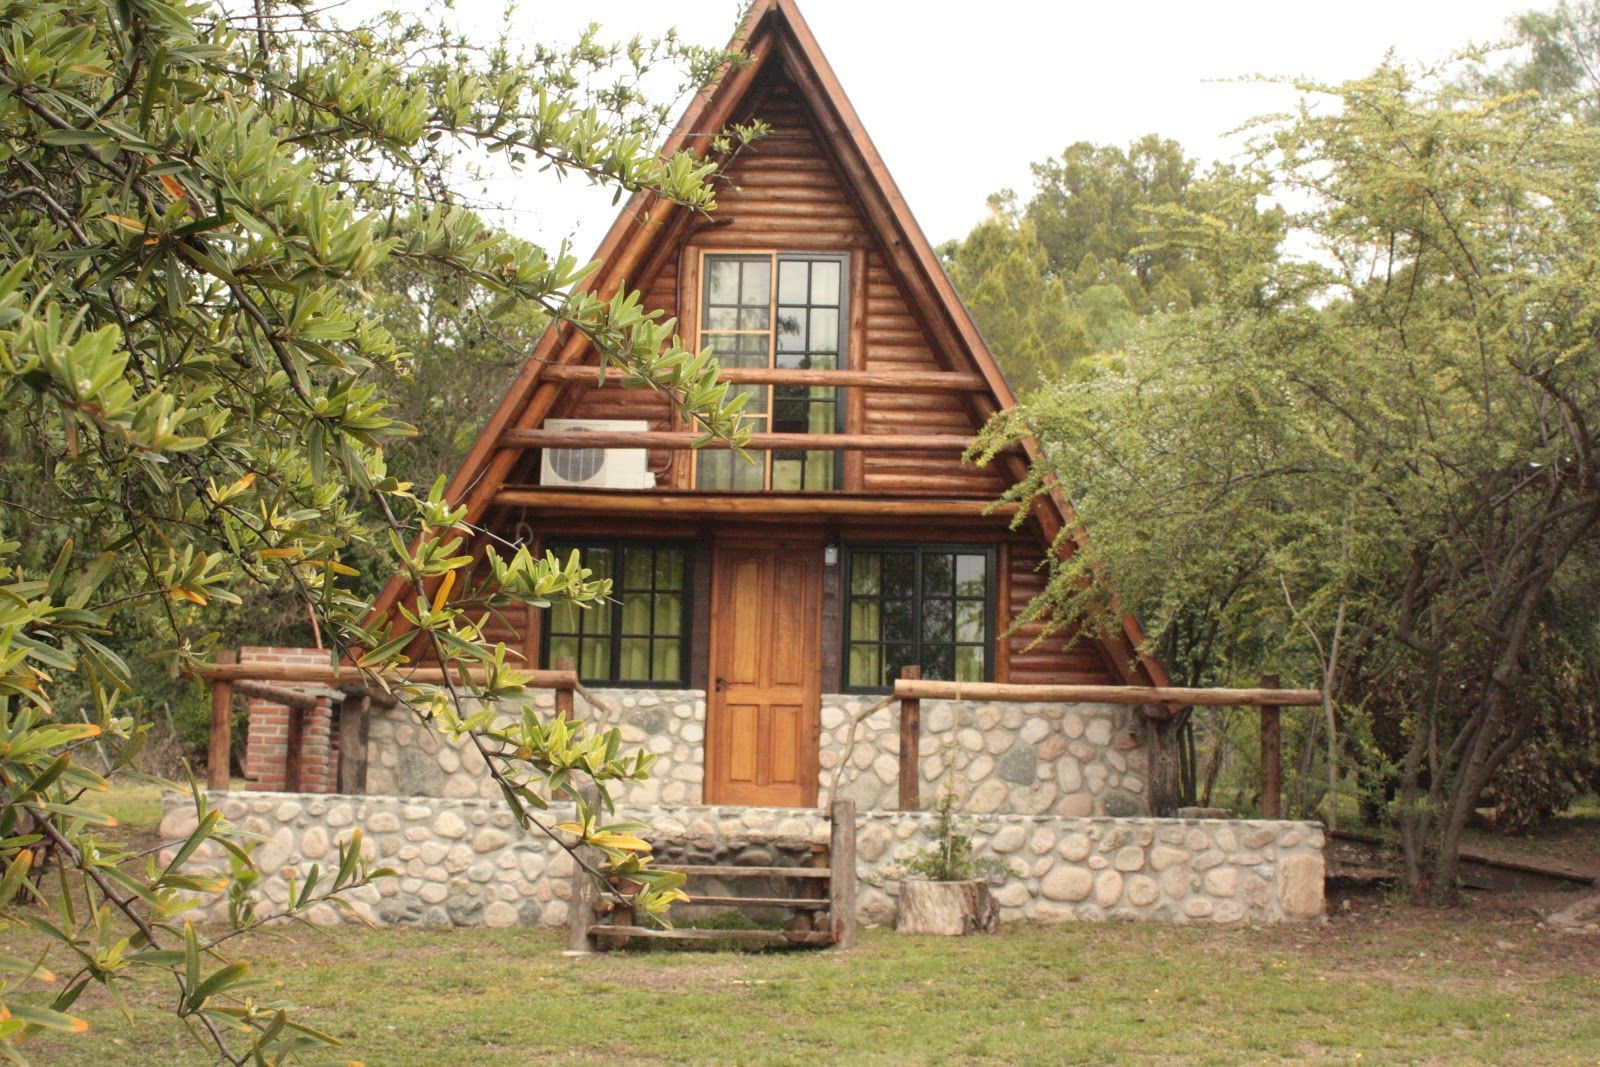 Cottages and Cabins   A-Frame   Pinterest   Öl